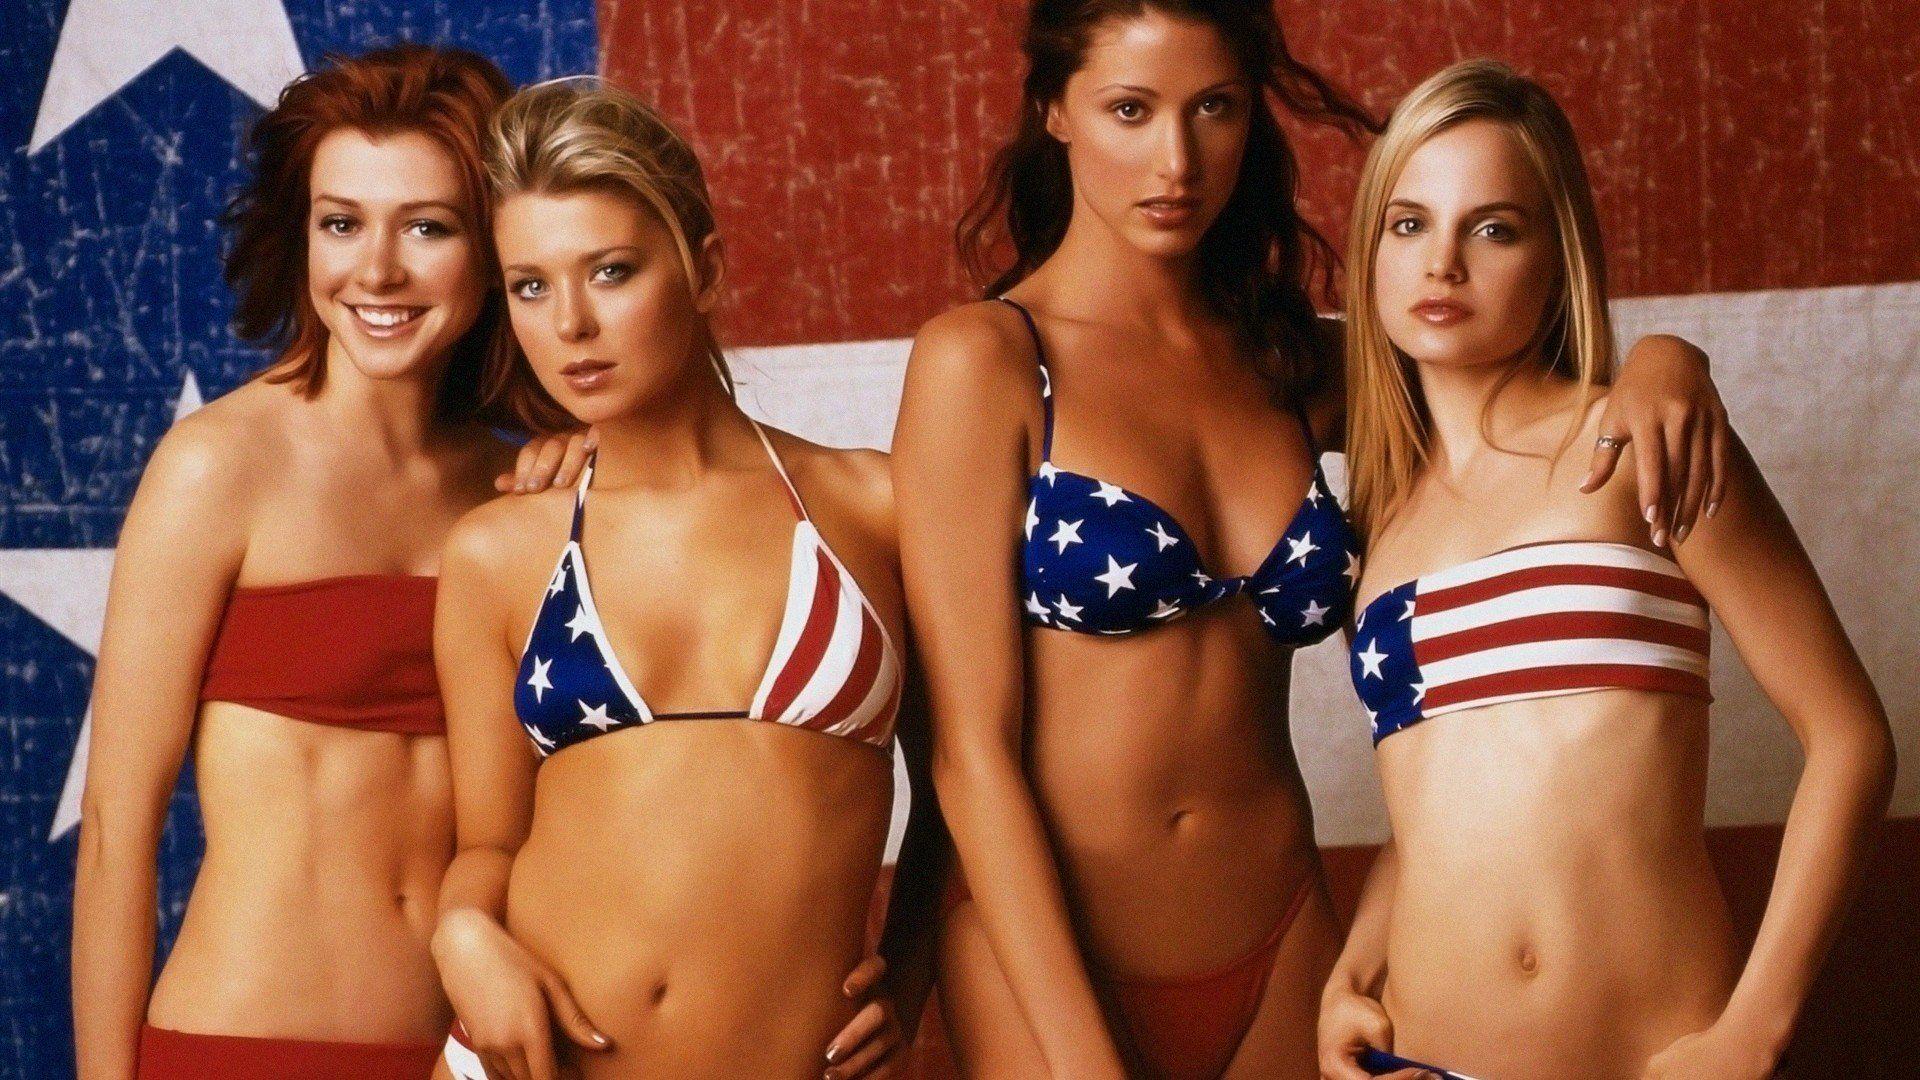 American Pie Presents Beta House Sex Scene pined stevenson on mena suvari | american pie, american